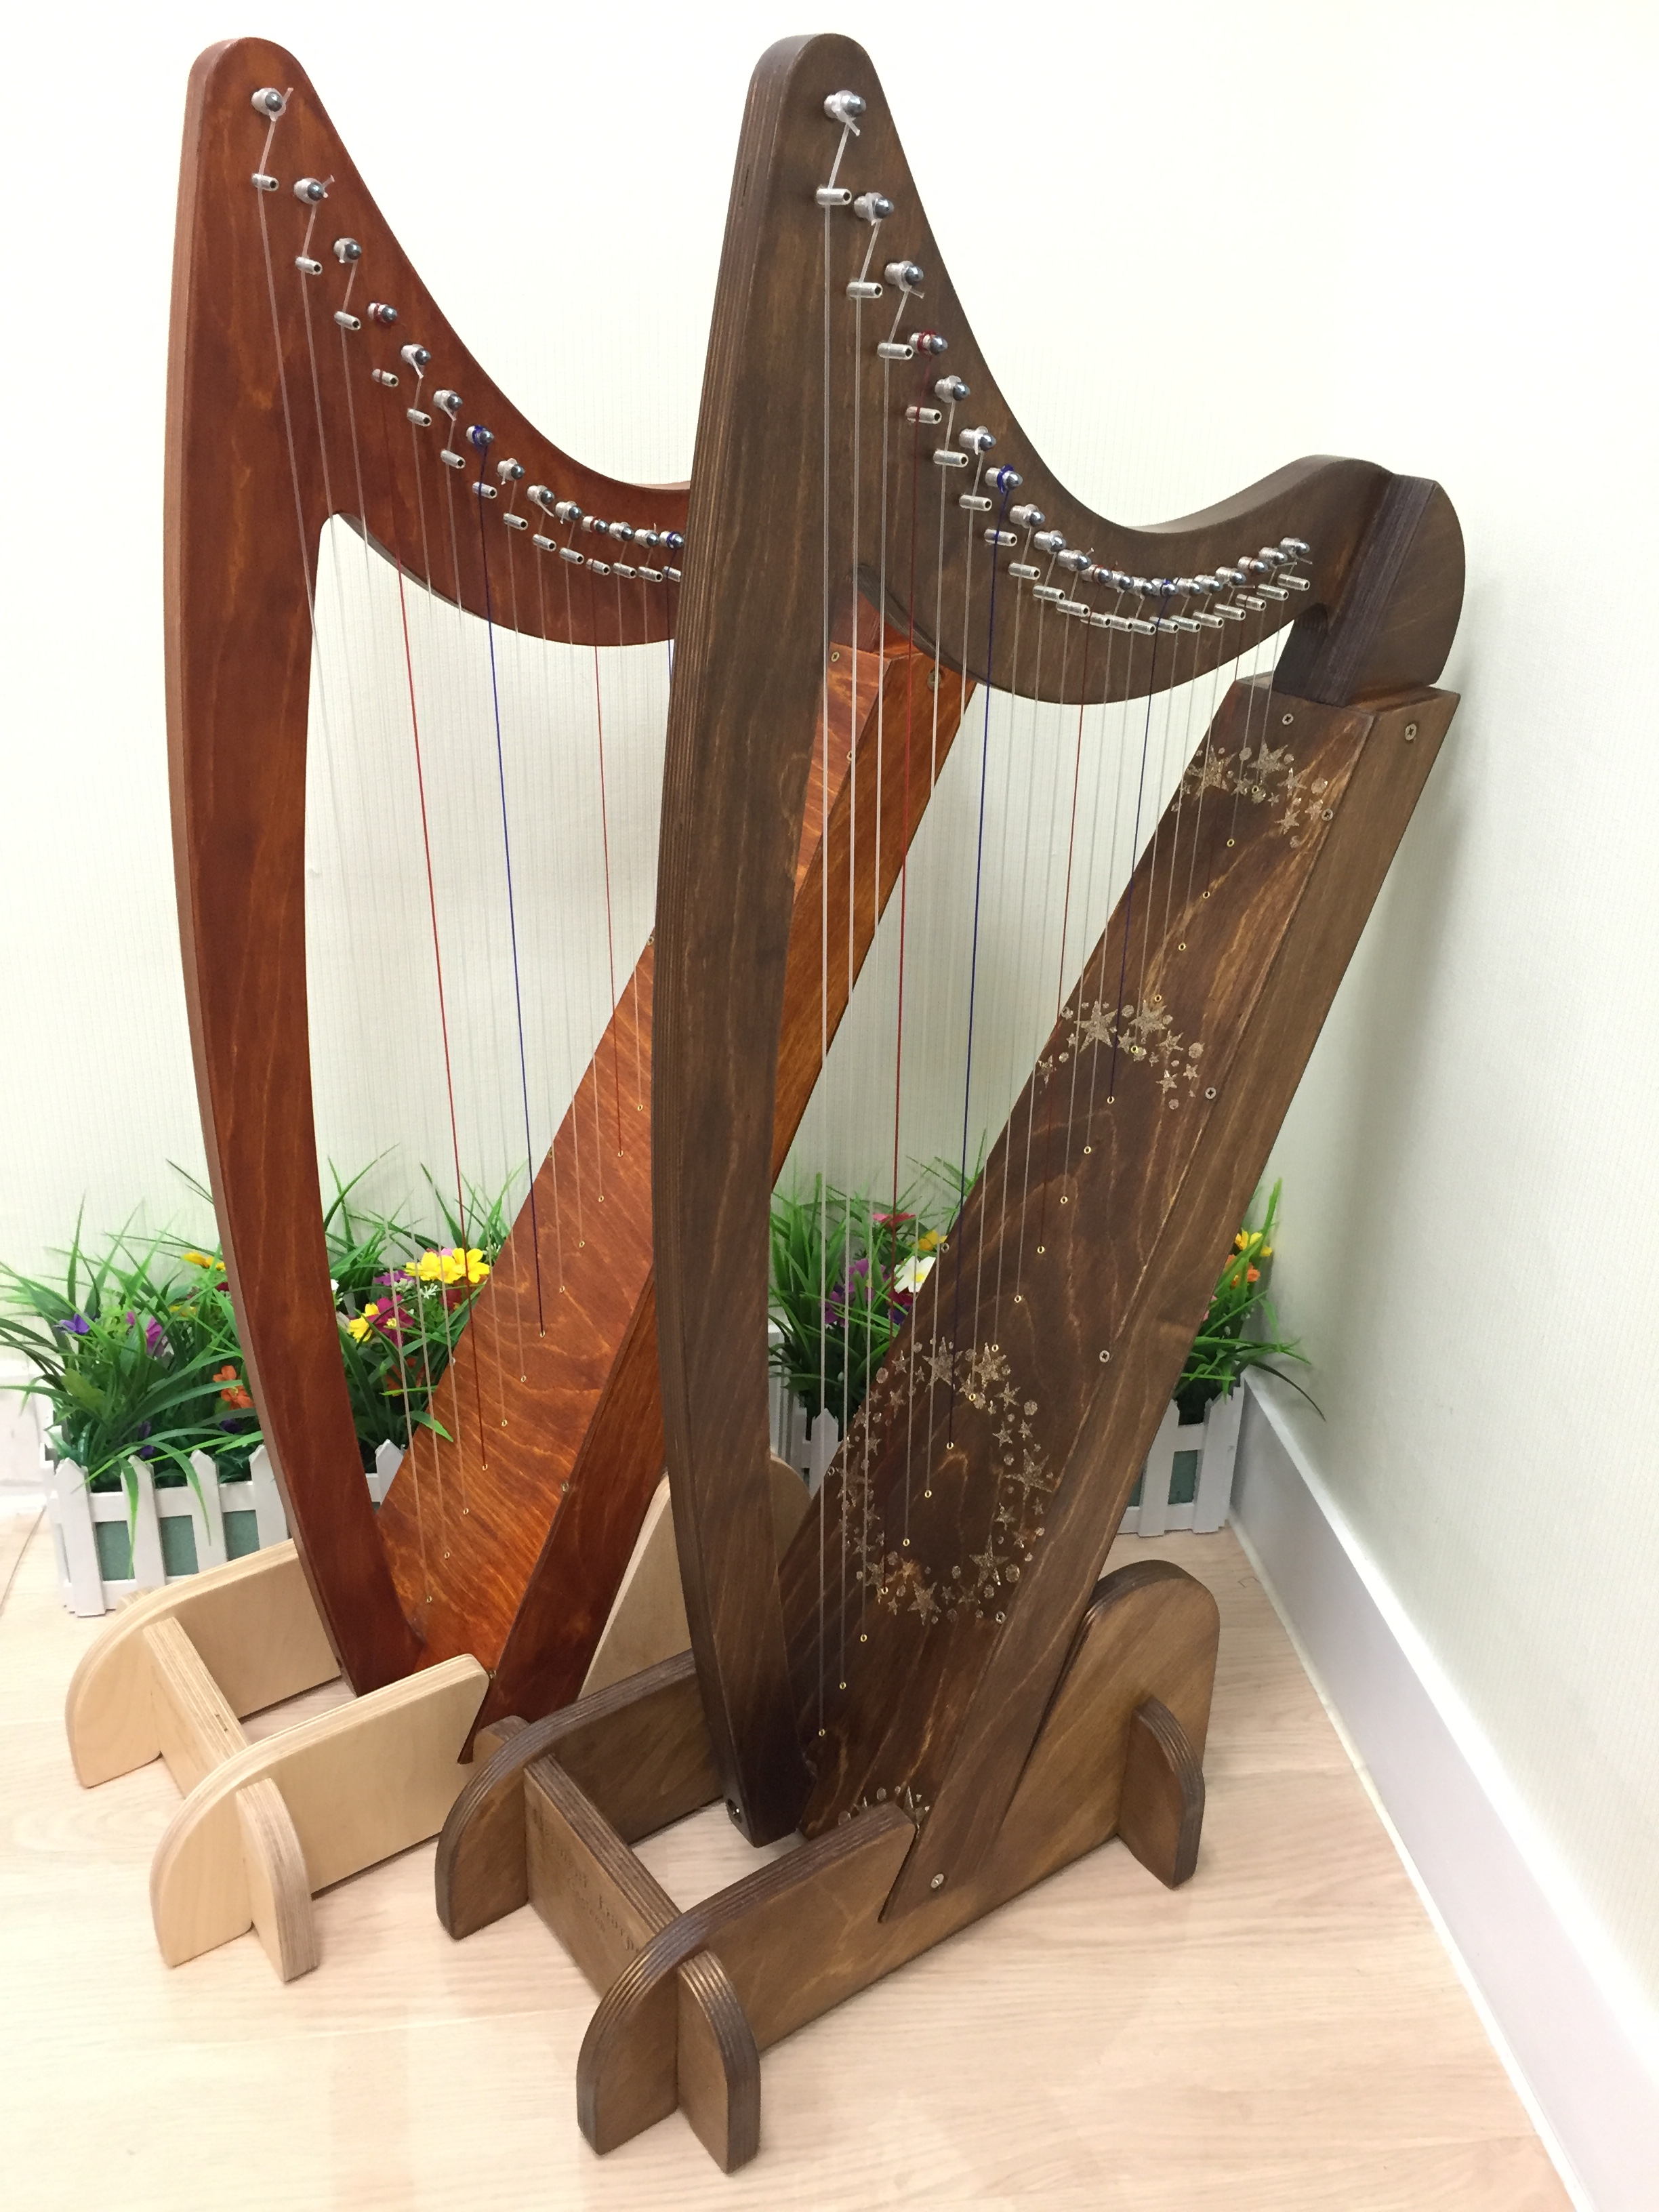 New Harp Arrival 最新豎琴貨品 – Harmonie Harp Music 香港豎琴藝術中心